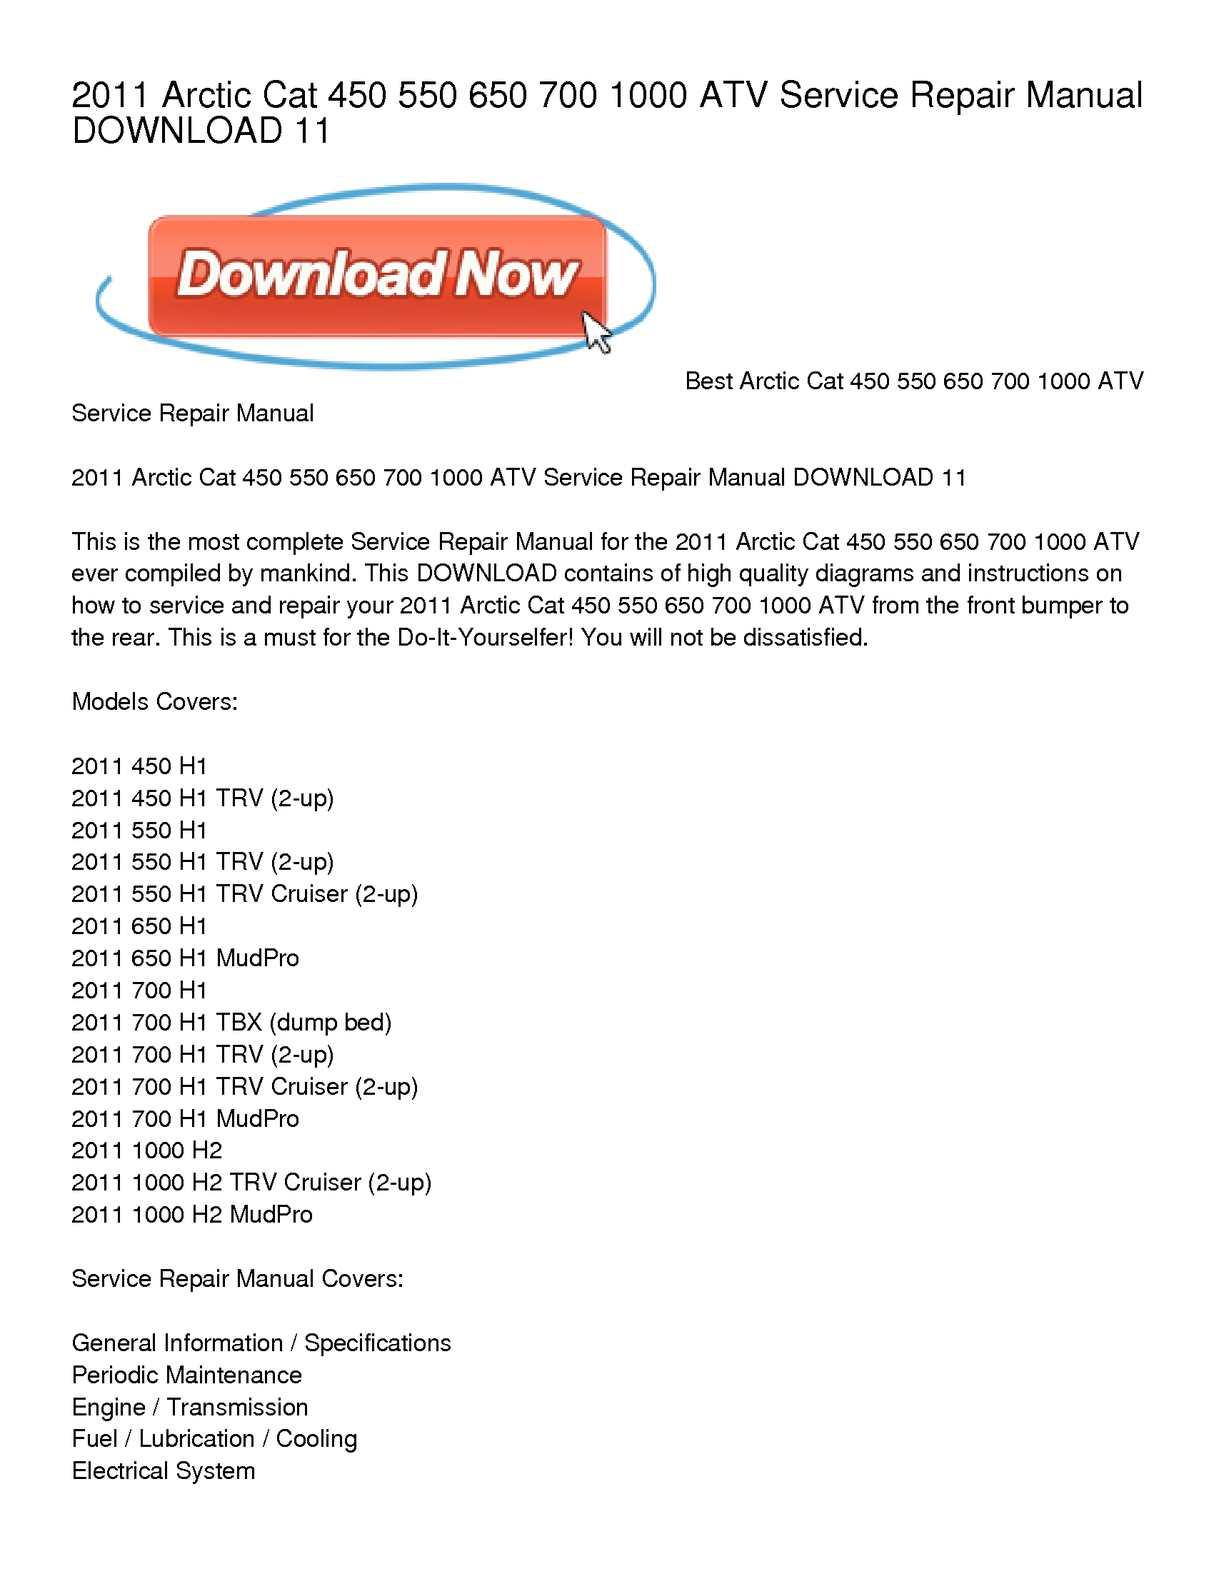 Calaméo - 2011 Arctic Cat 450 550 650 700 1000 ATV Service Repair Manual  DOWNLOAD 11